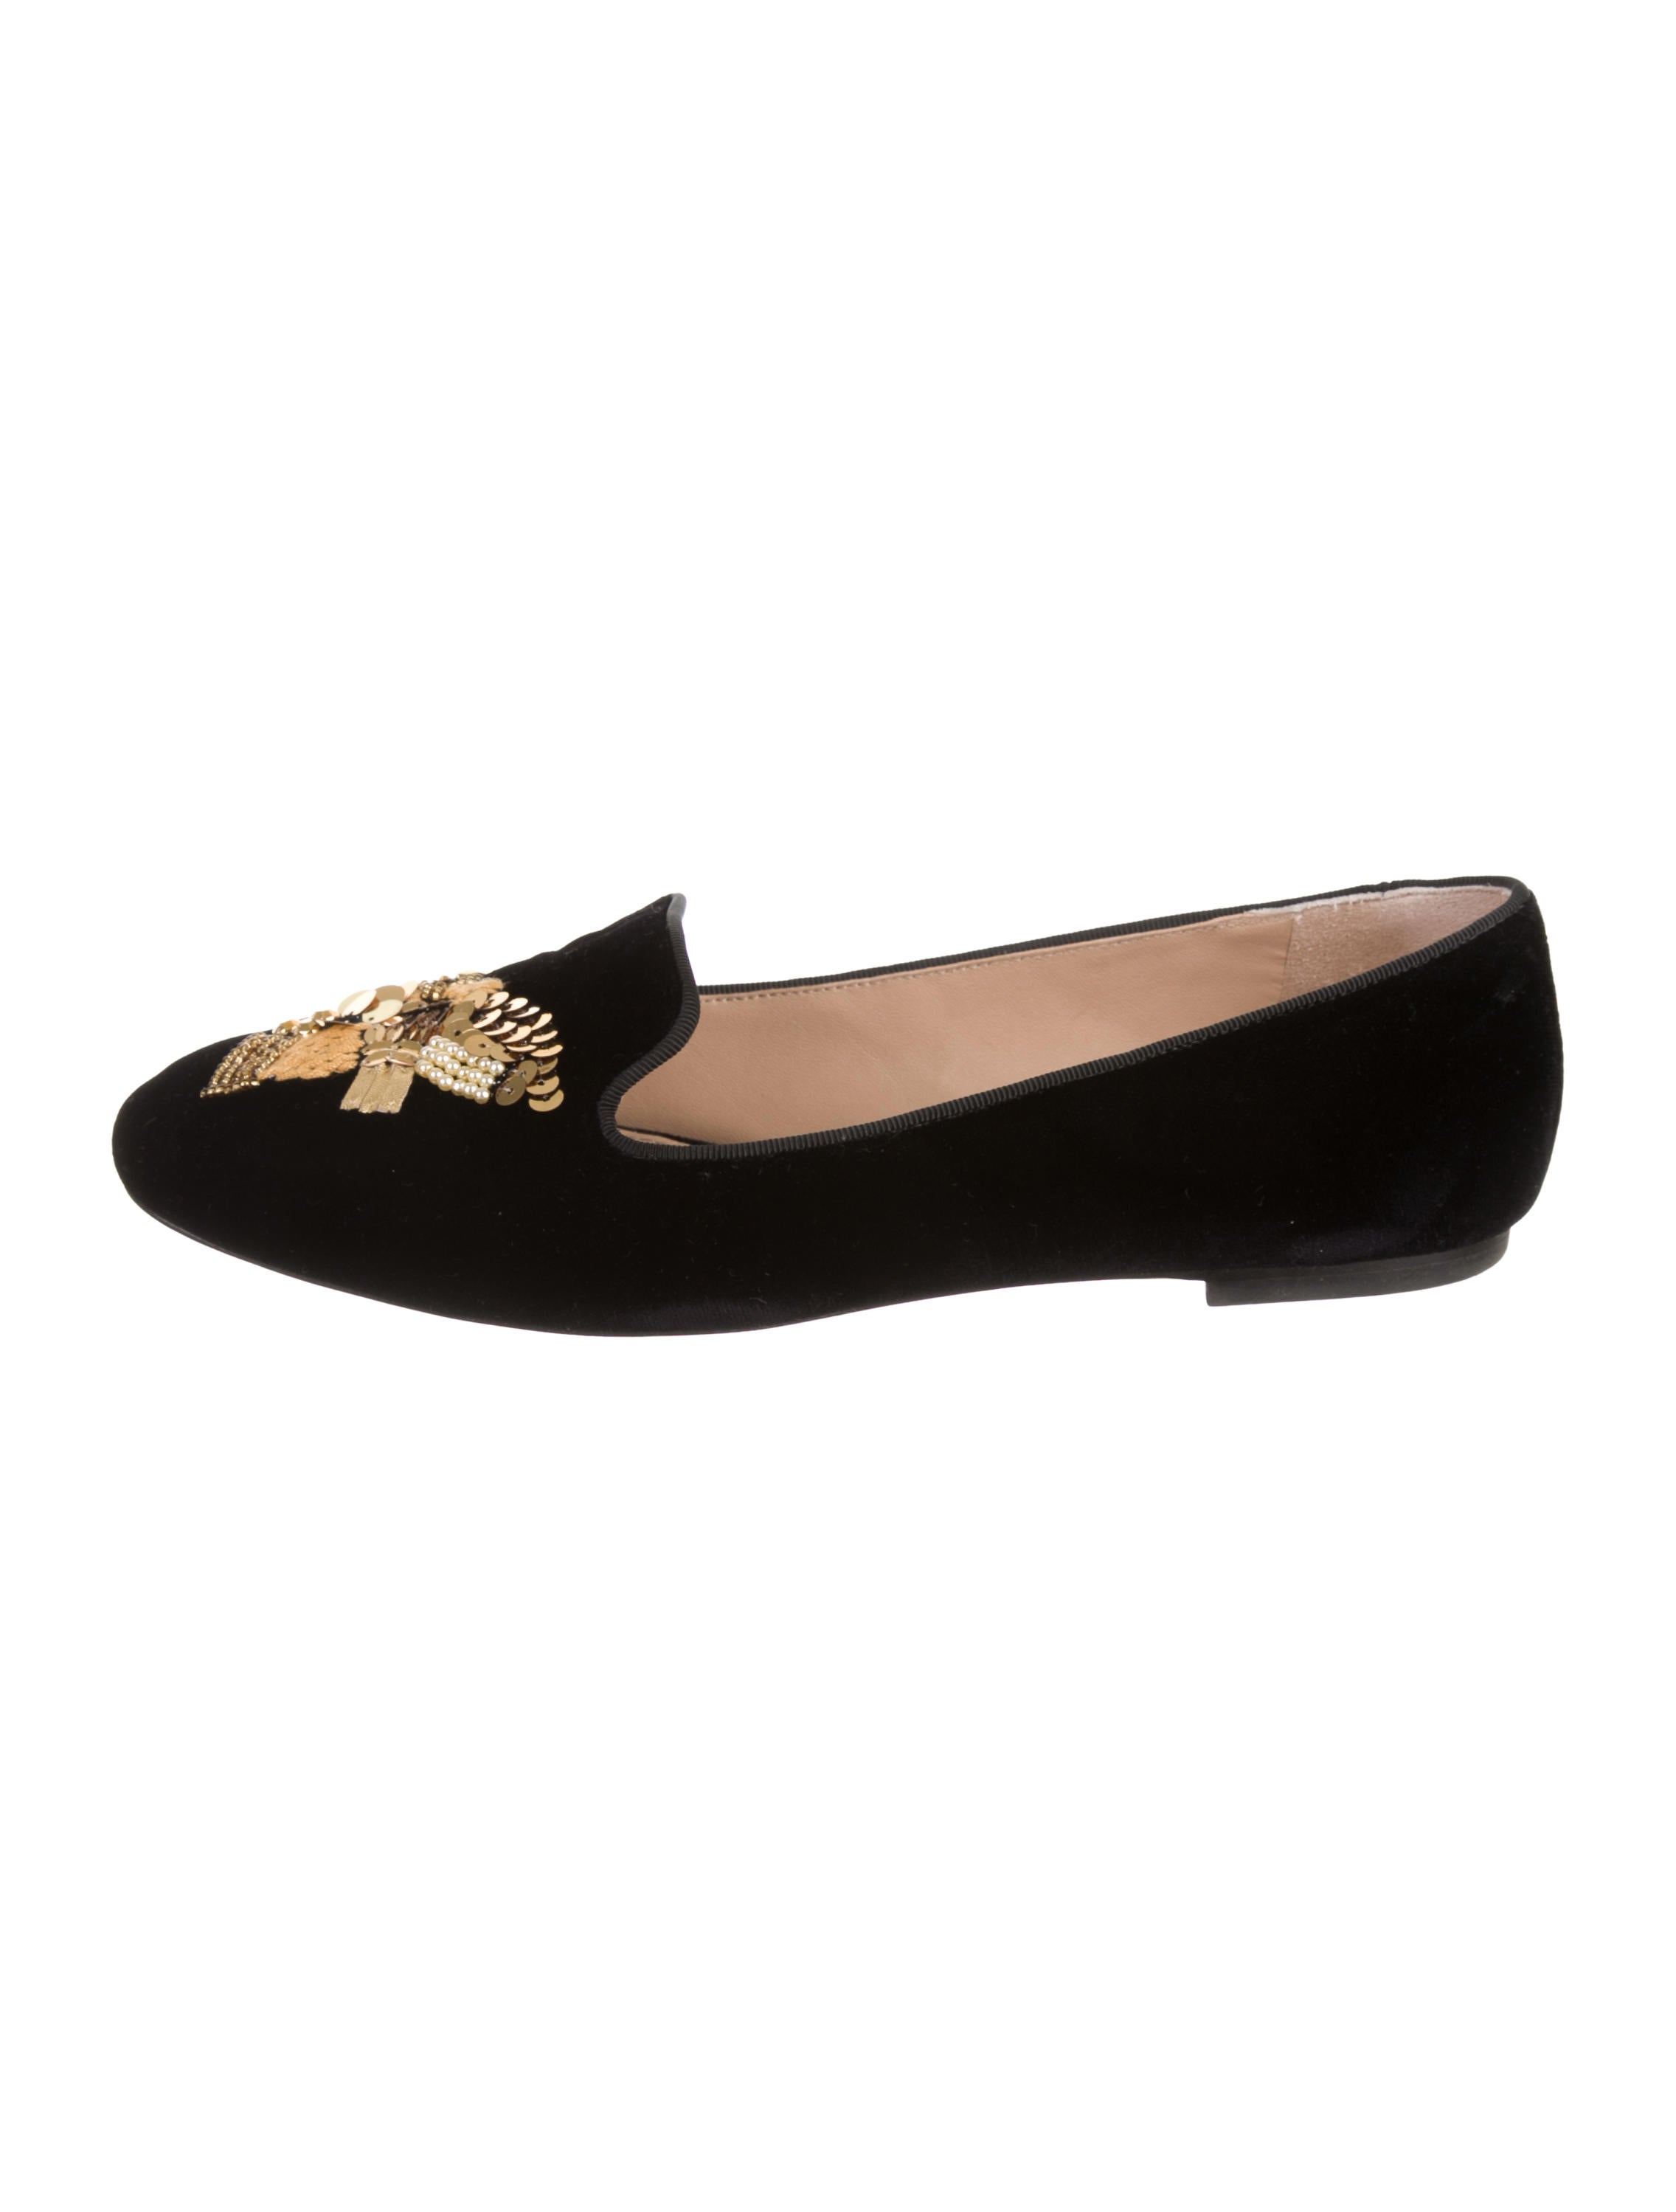 6e3ae9b4abf Tory Burch Peace Smoking Slippers - Shoes - WTO160010